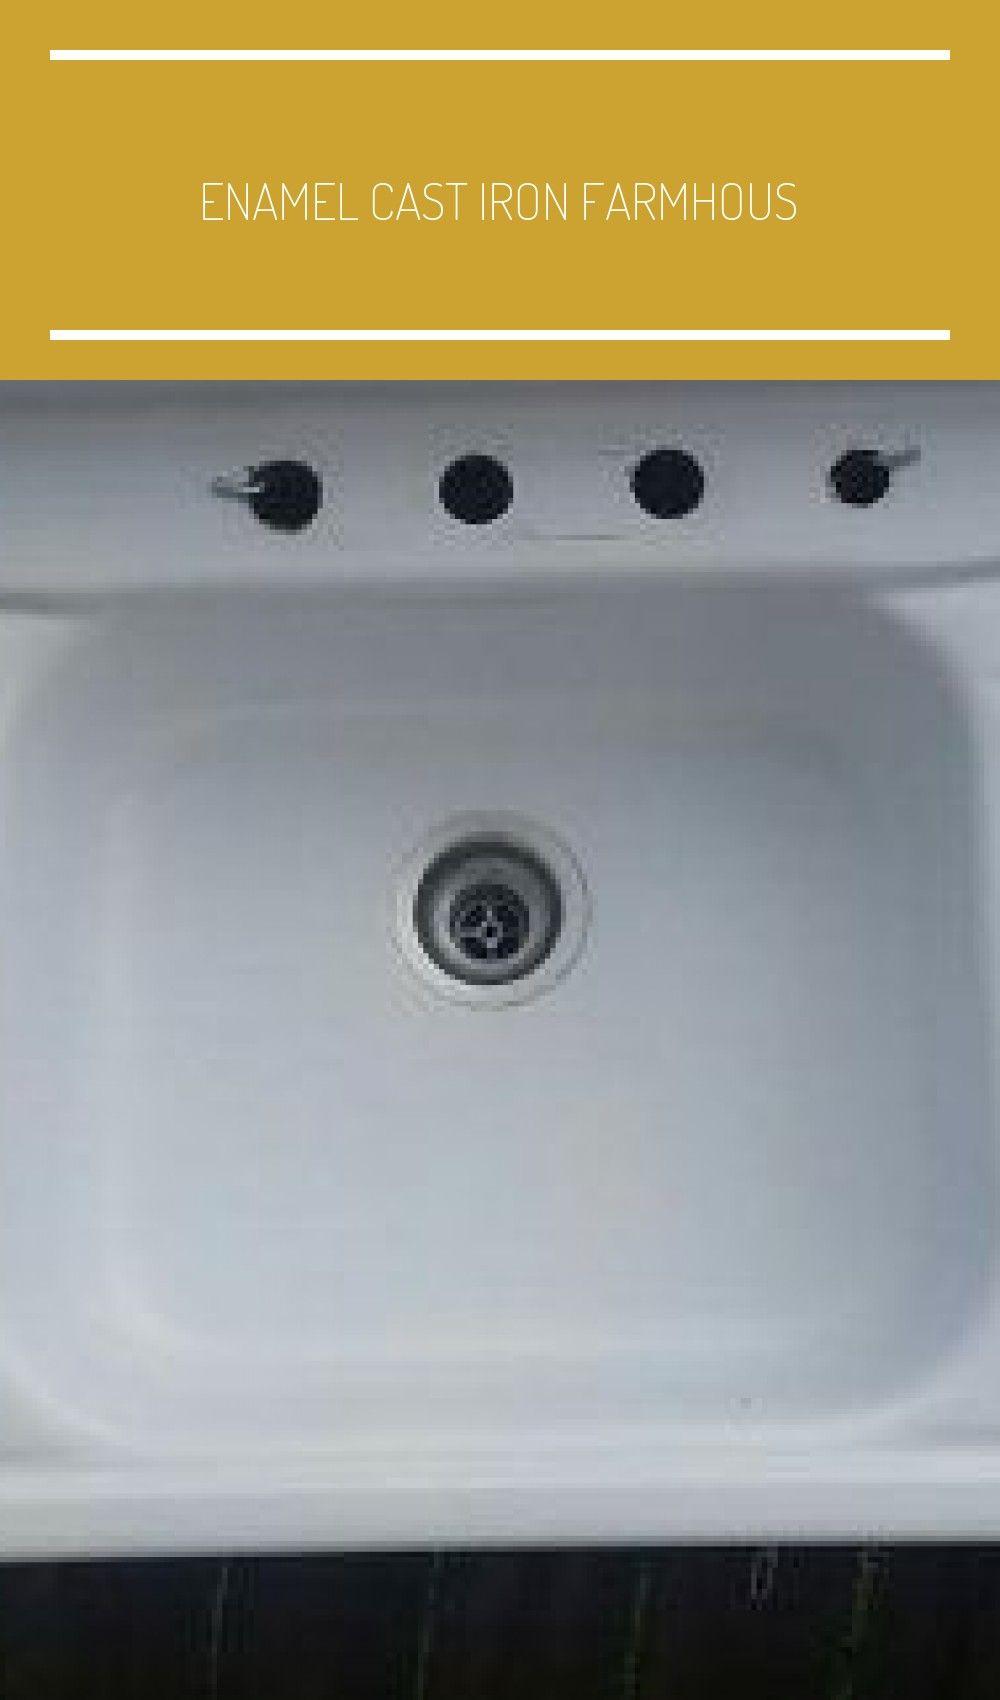 Enamel Cast Iron Farmhouse Sink Kitchen Sink With Drainboard